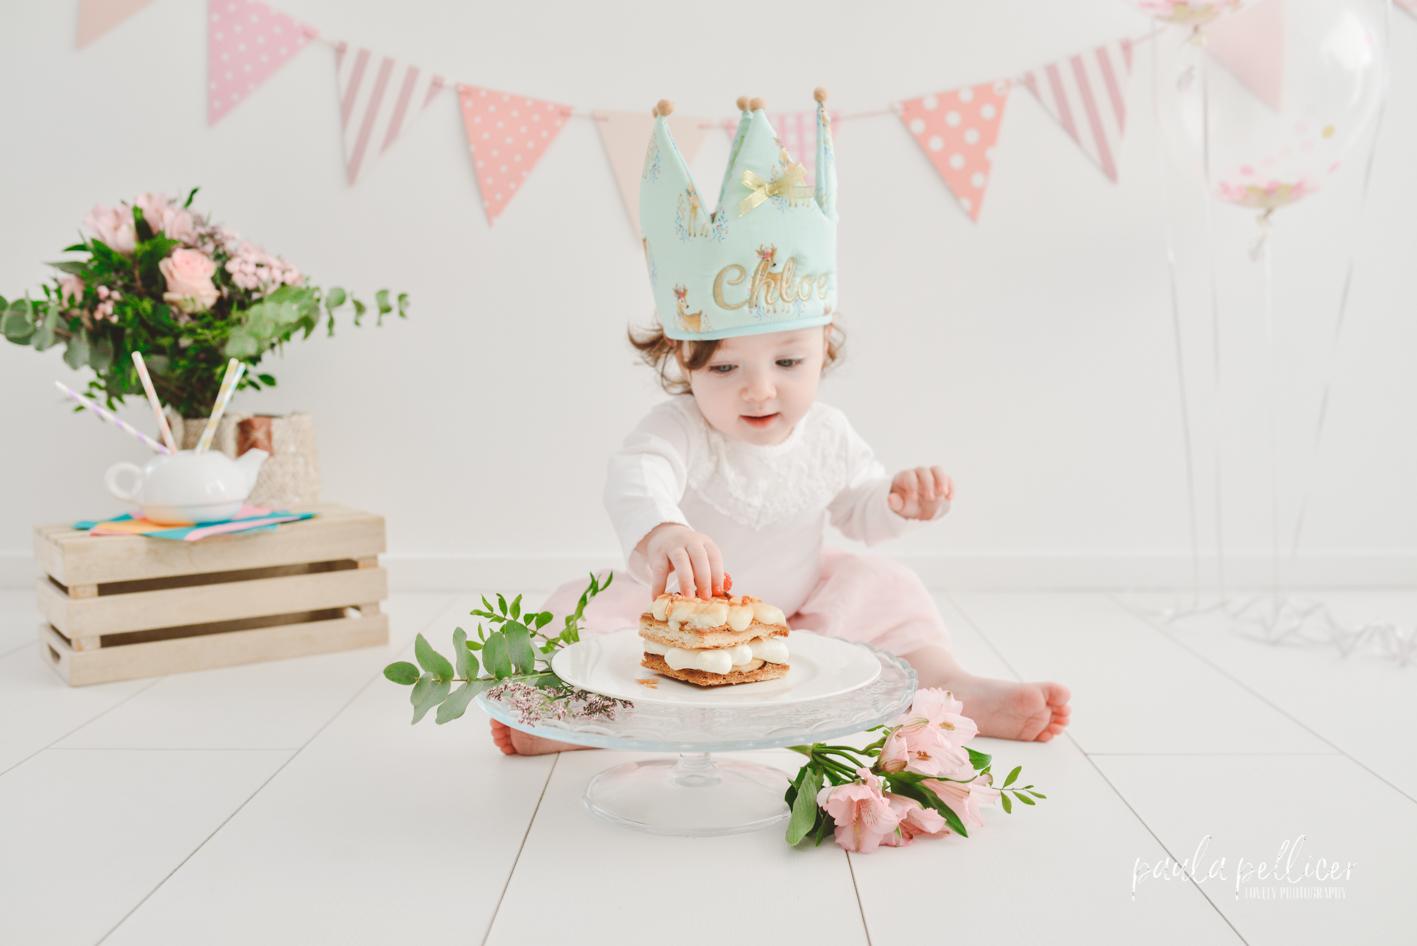 SMASH THE CAKE: CHLOE Y GINA